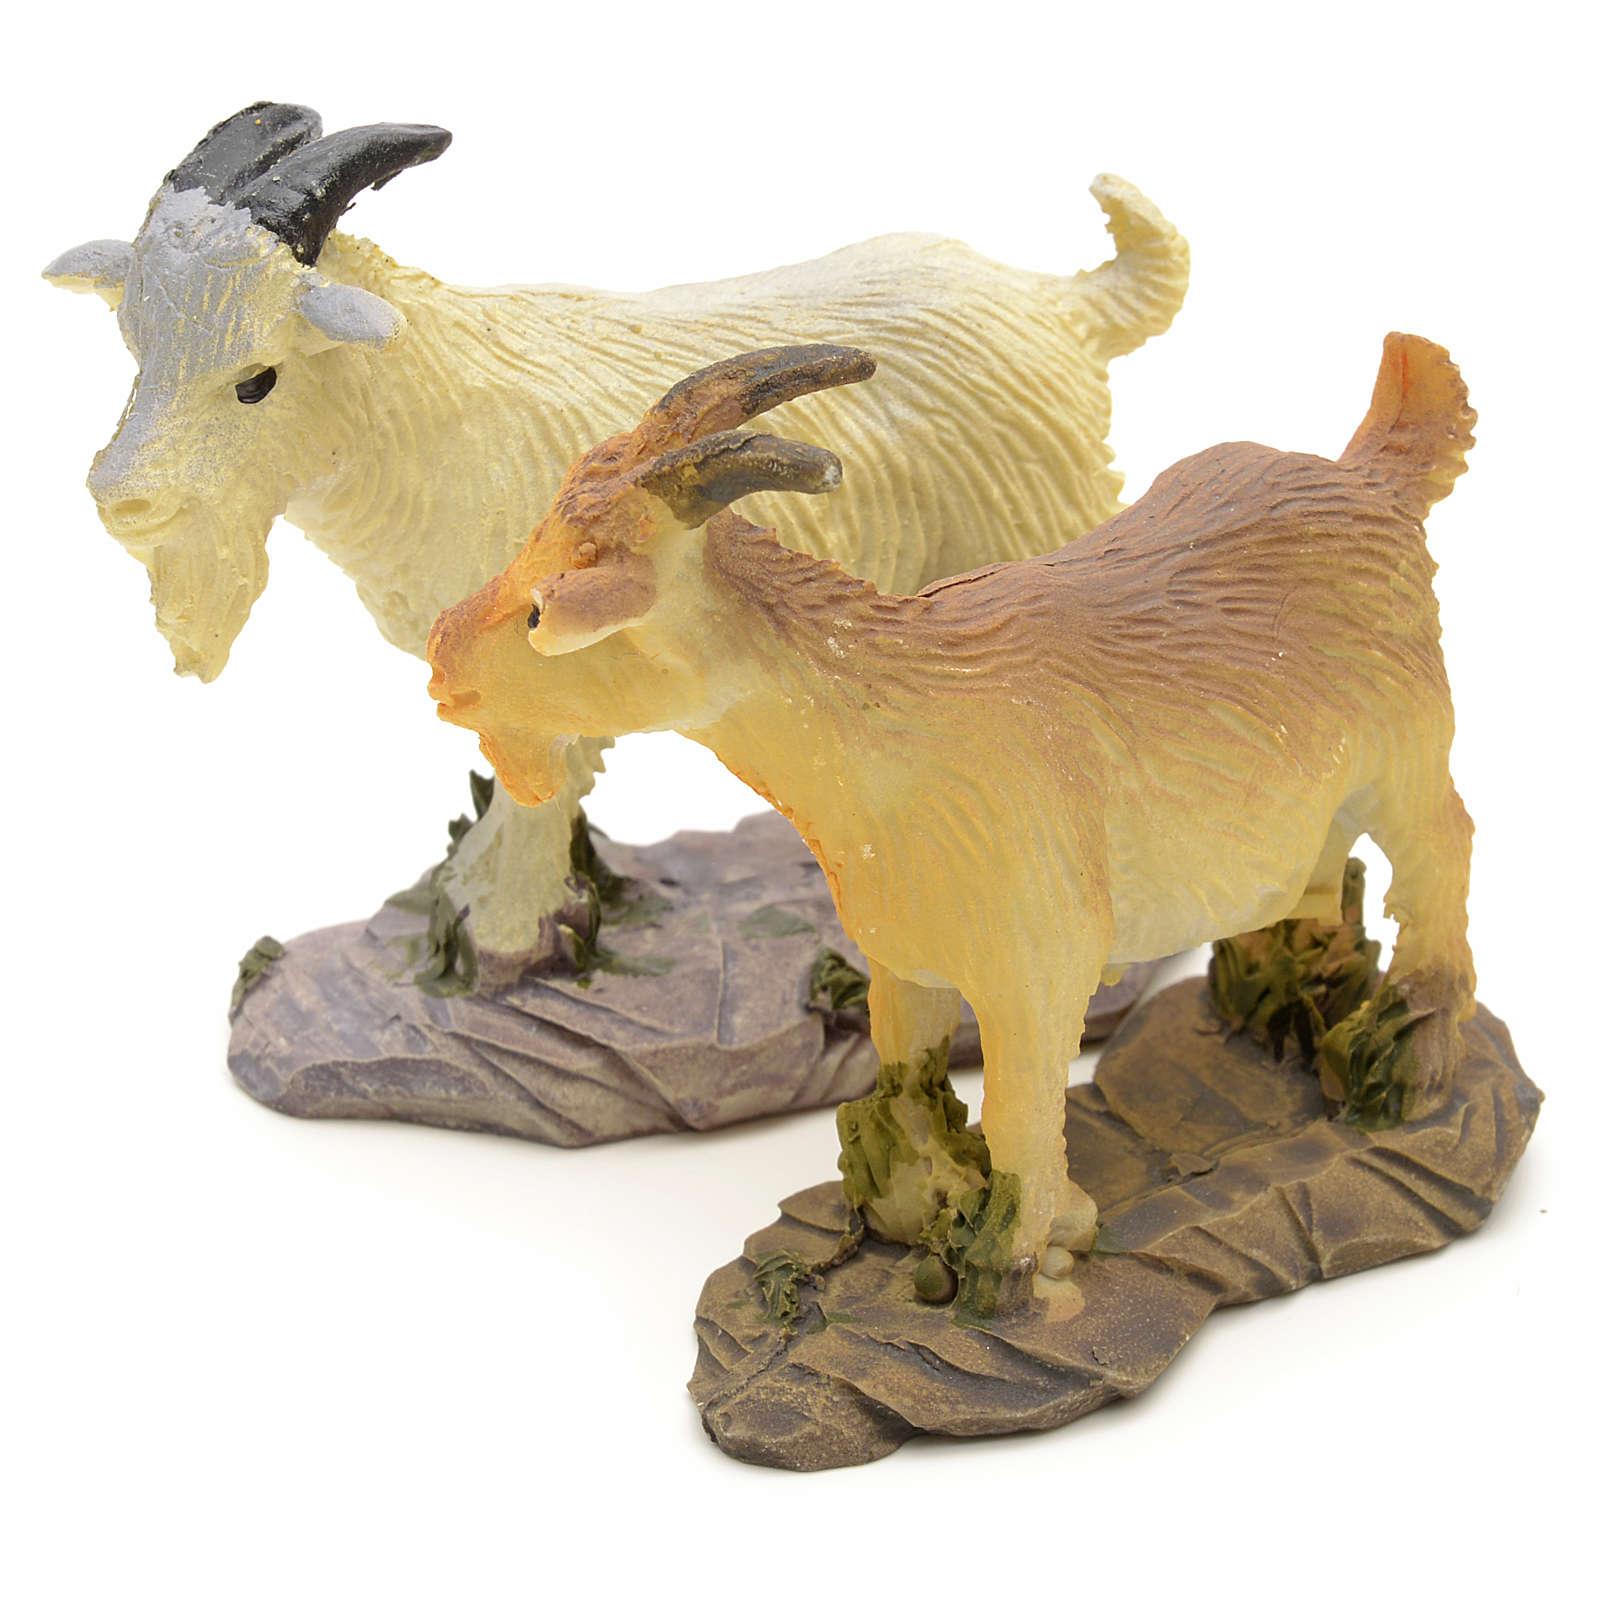 Nativity figurine, resin goat, 10-14cm 3